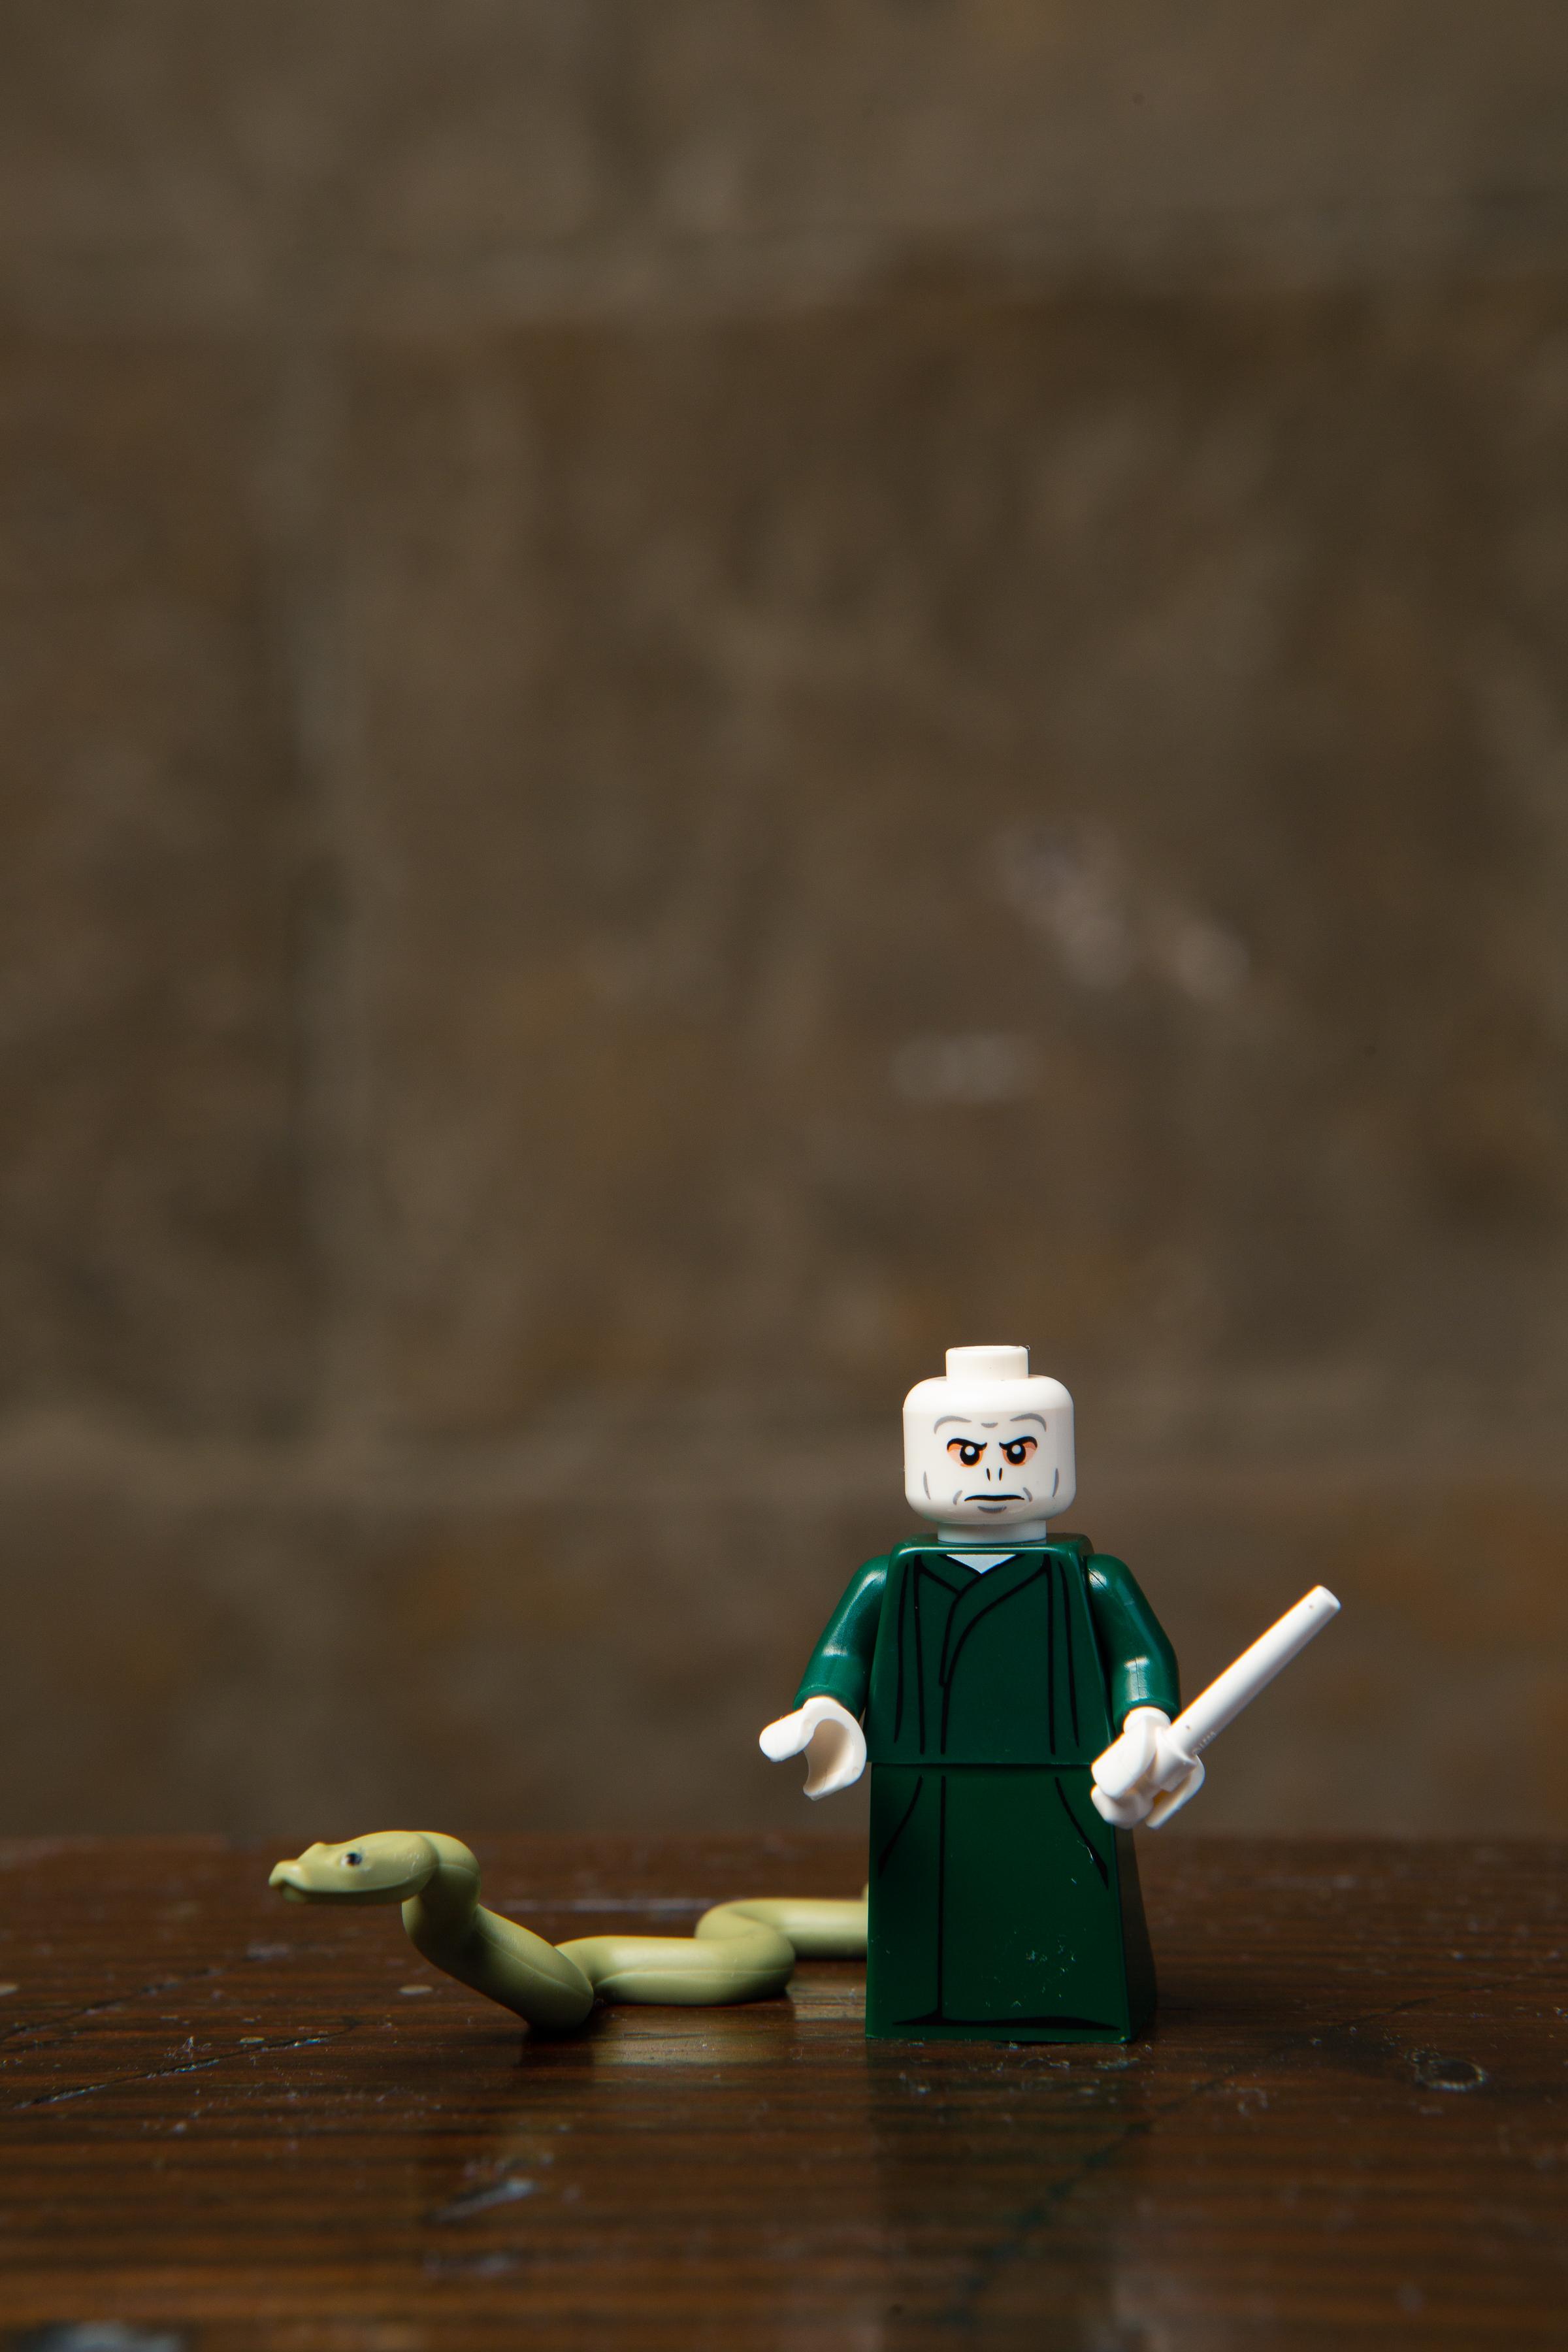 LEGO_WBST_19.06.18_hi-res-15.jpg